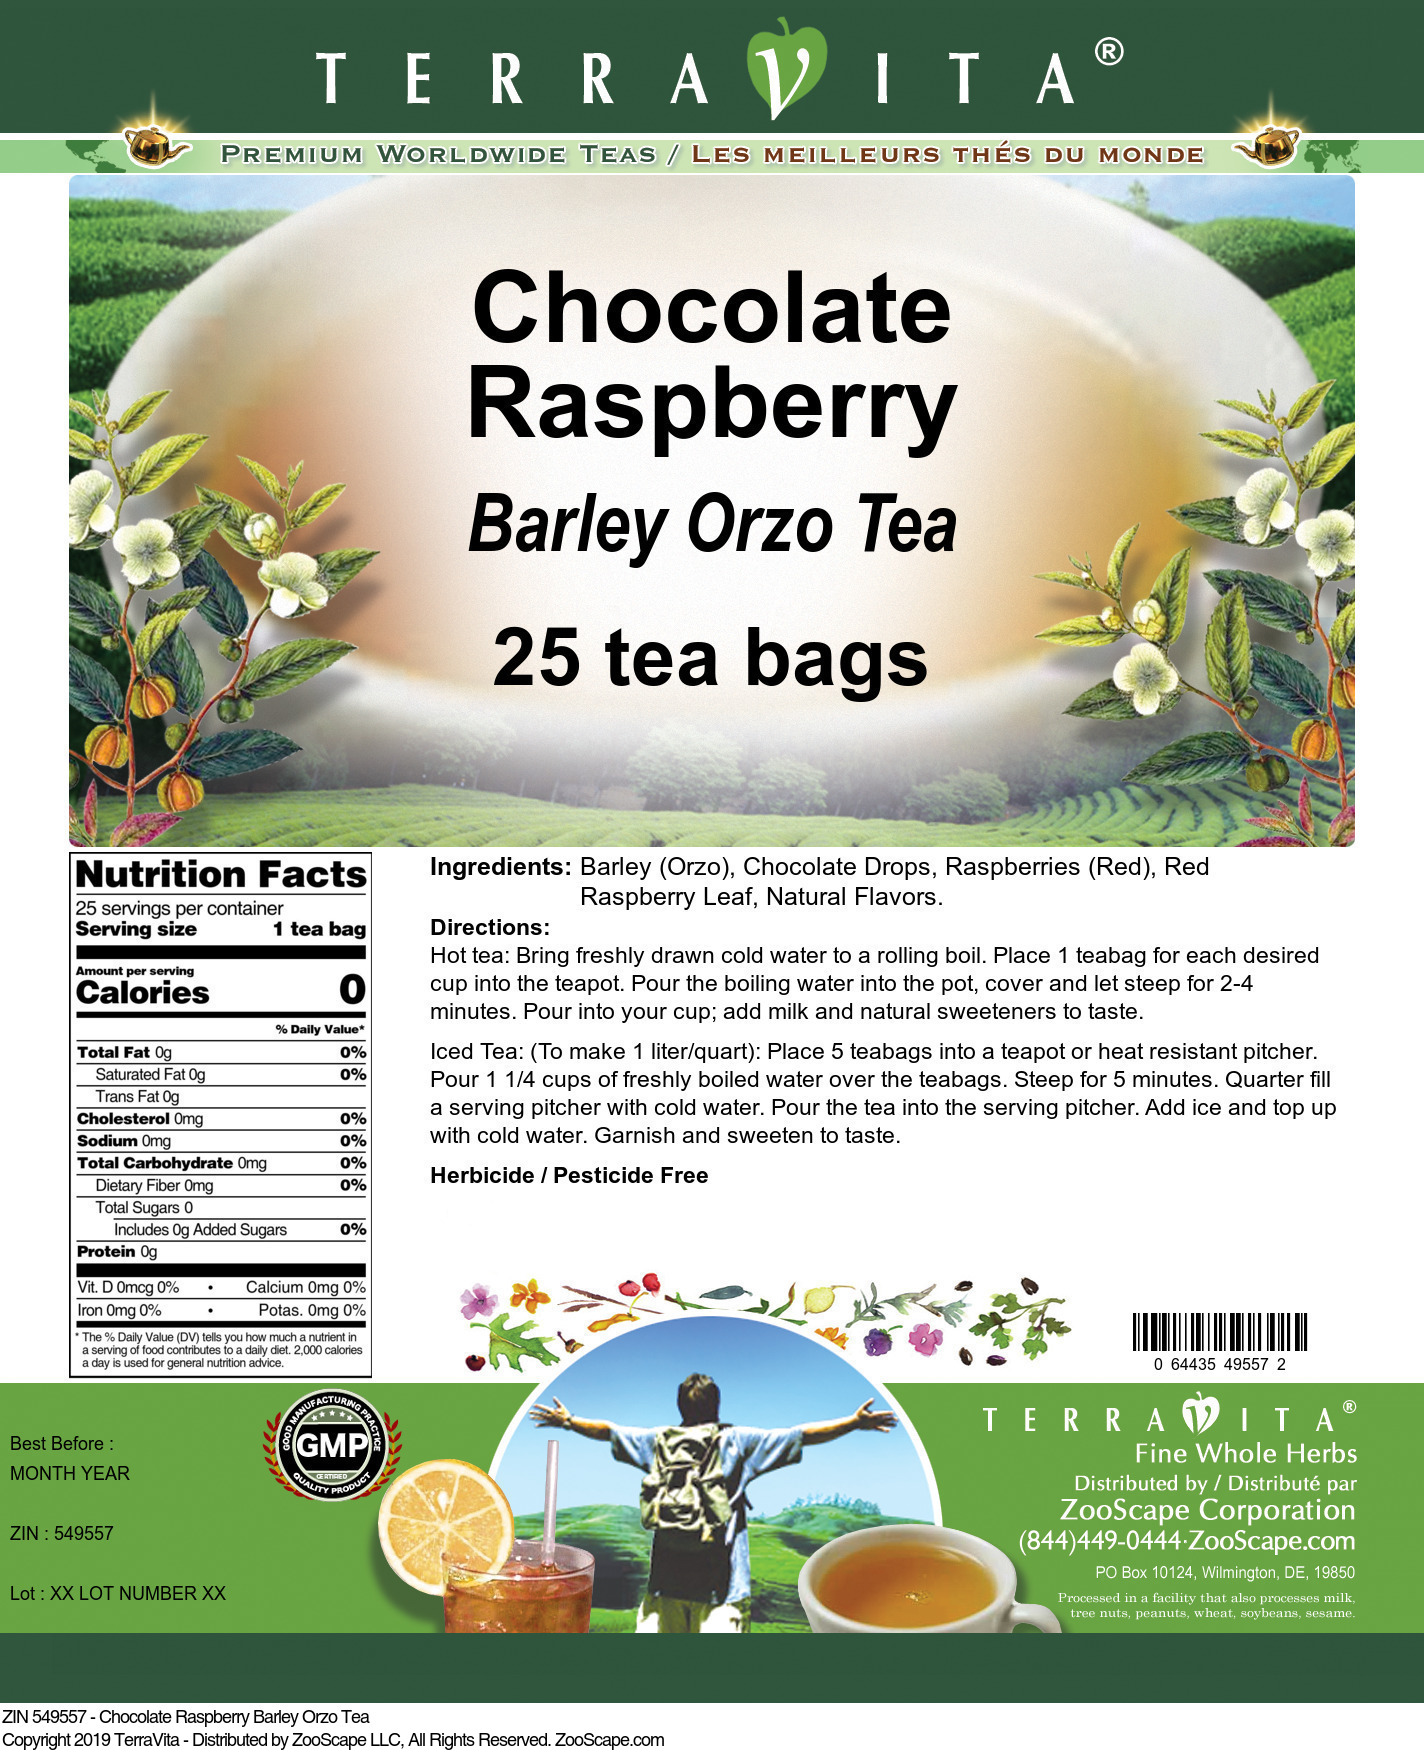 Chocolate Raspberry Barley Orzo